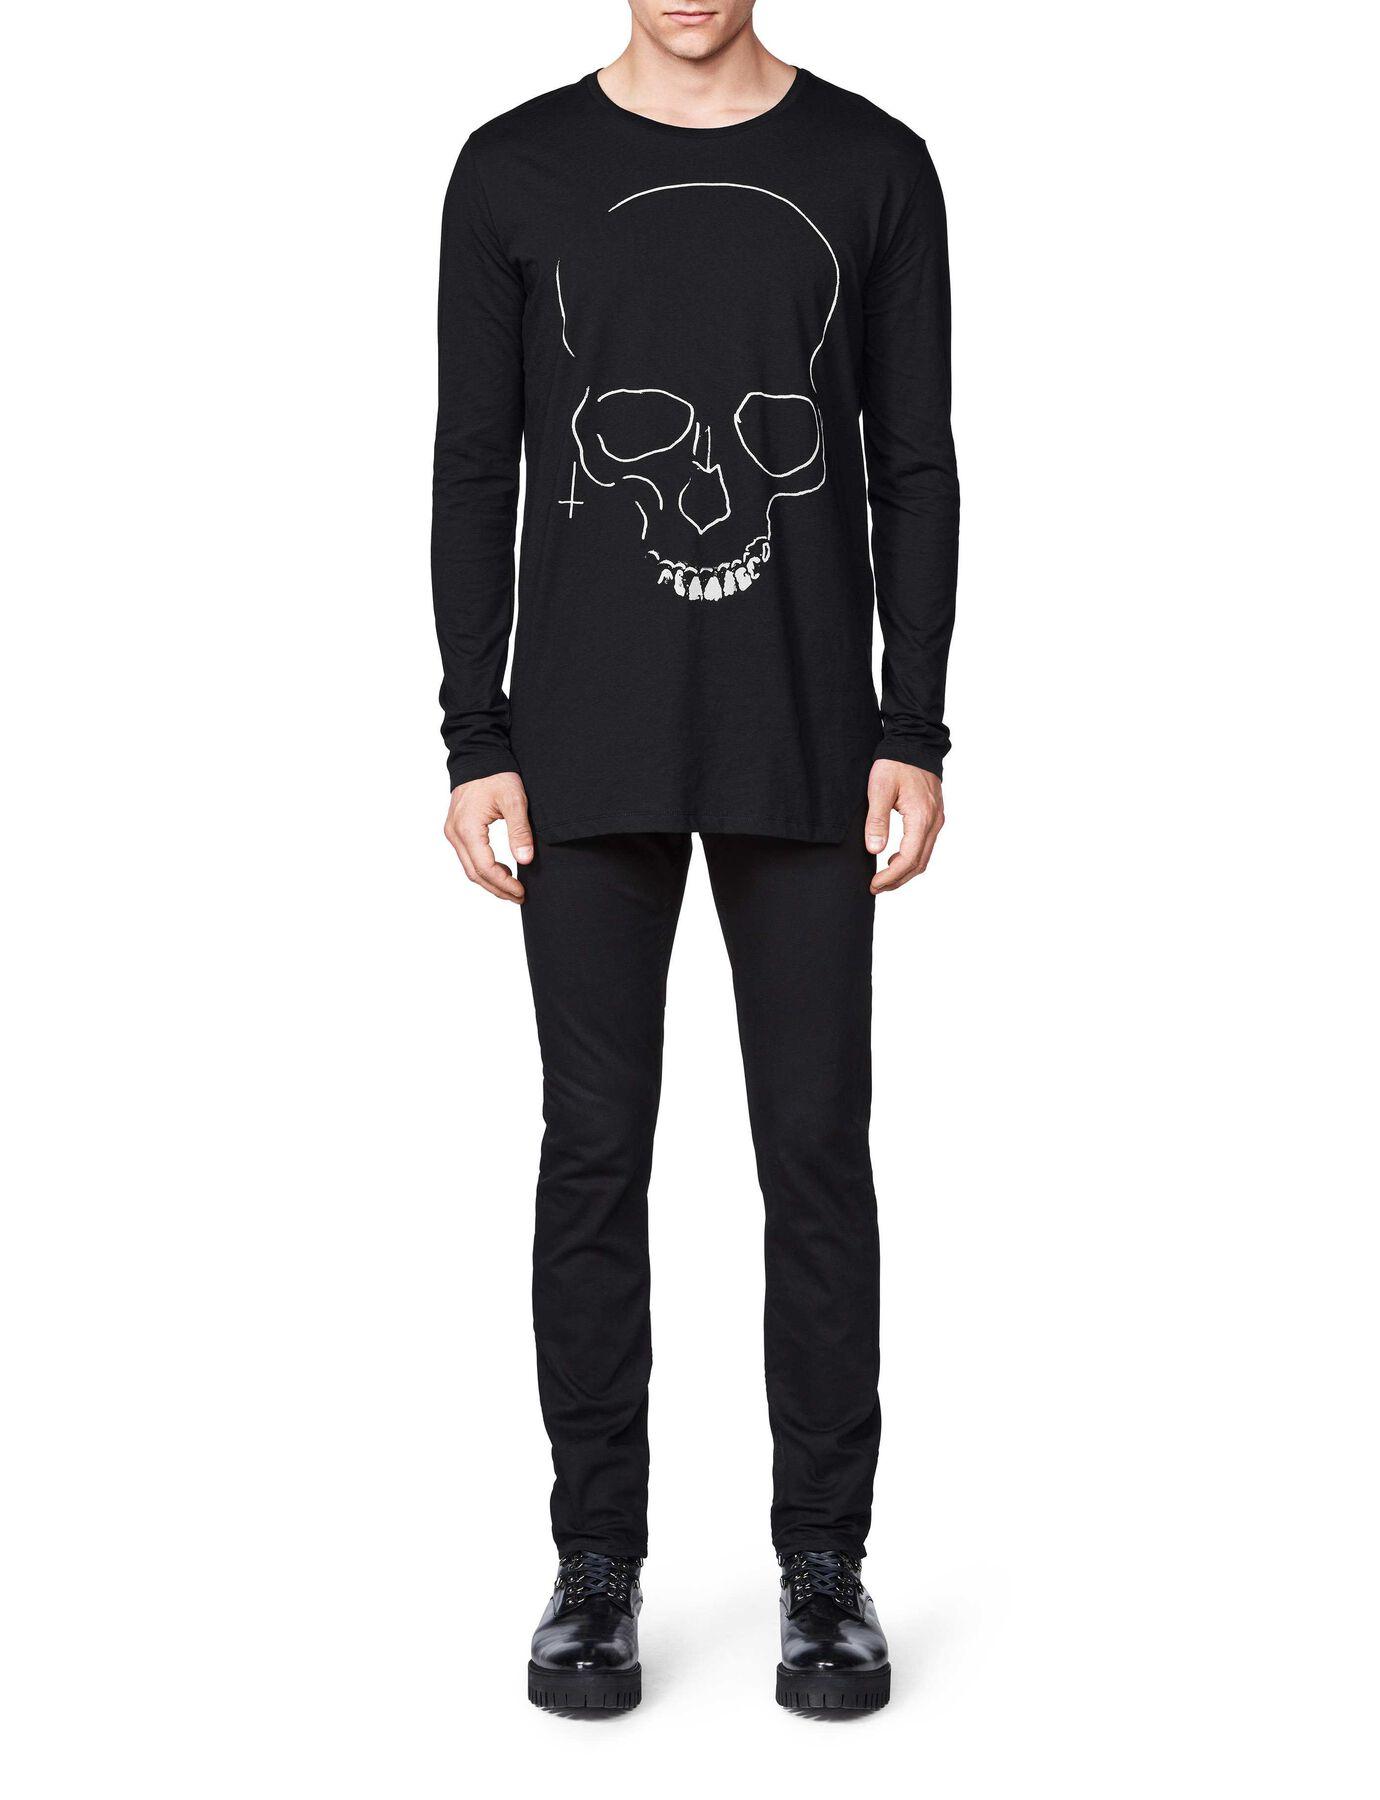 Grit t-shirt in Black from Tiger of Sweden